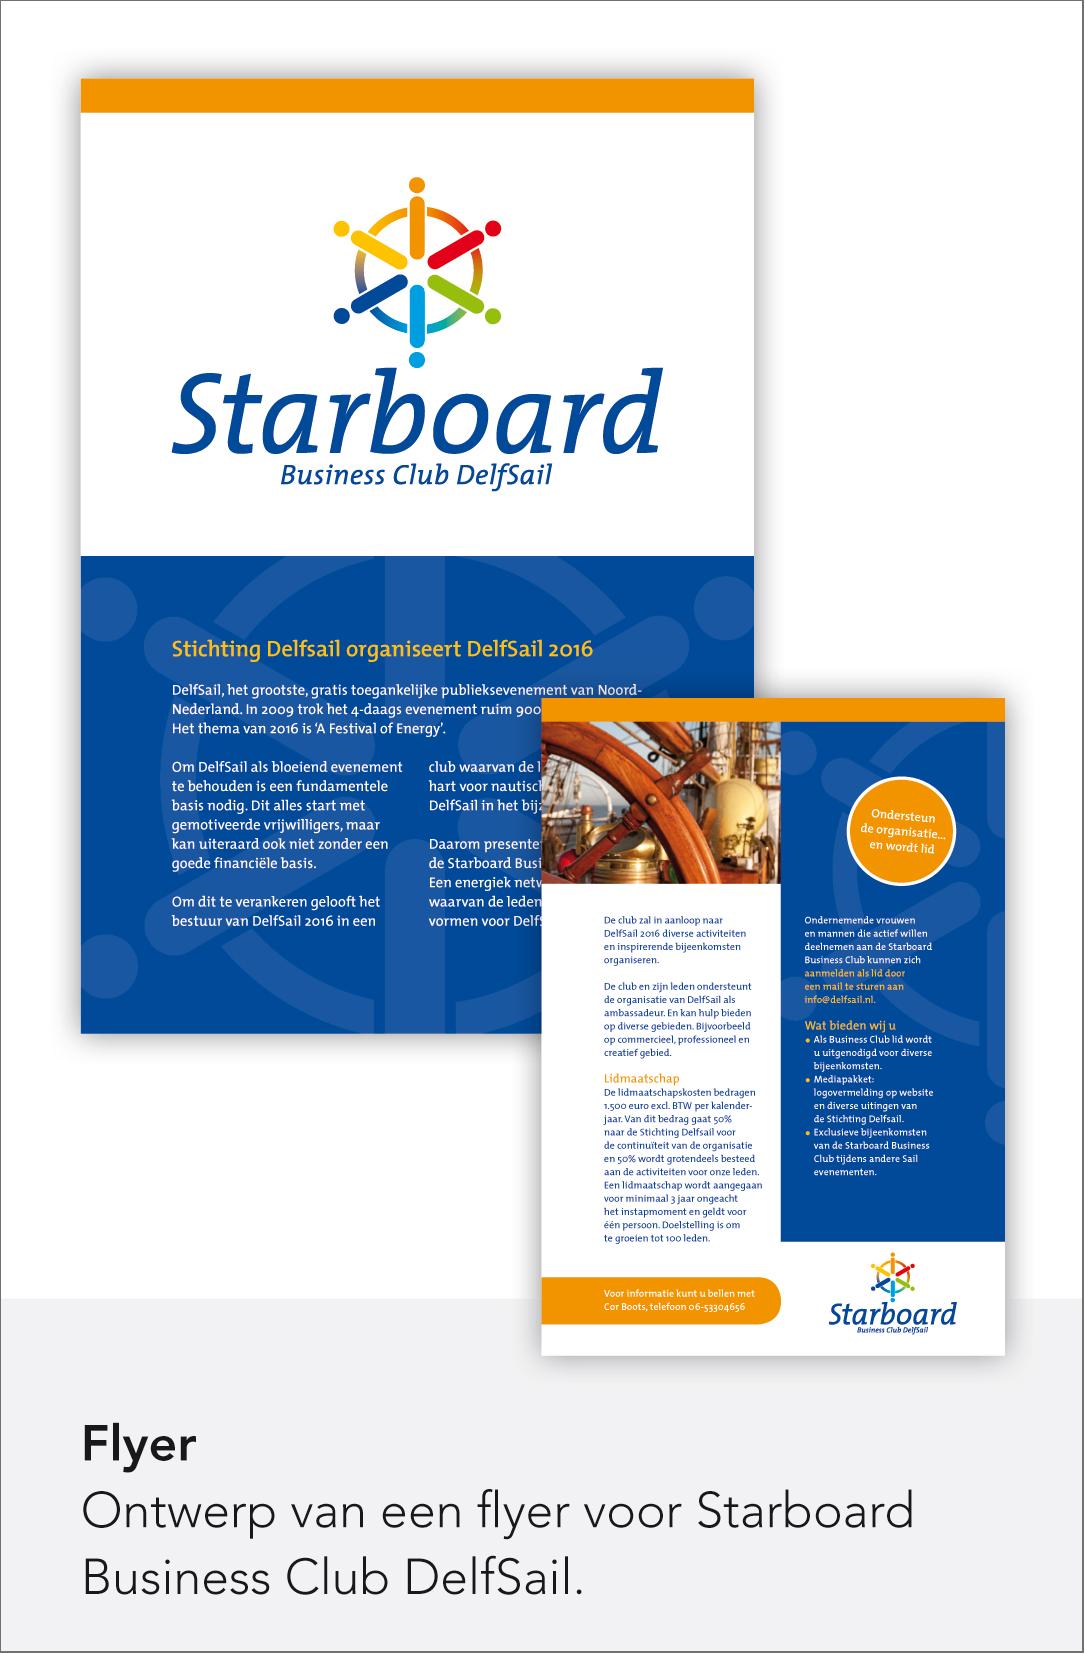 Starboard BCD - Flyer